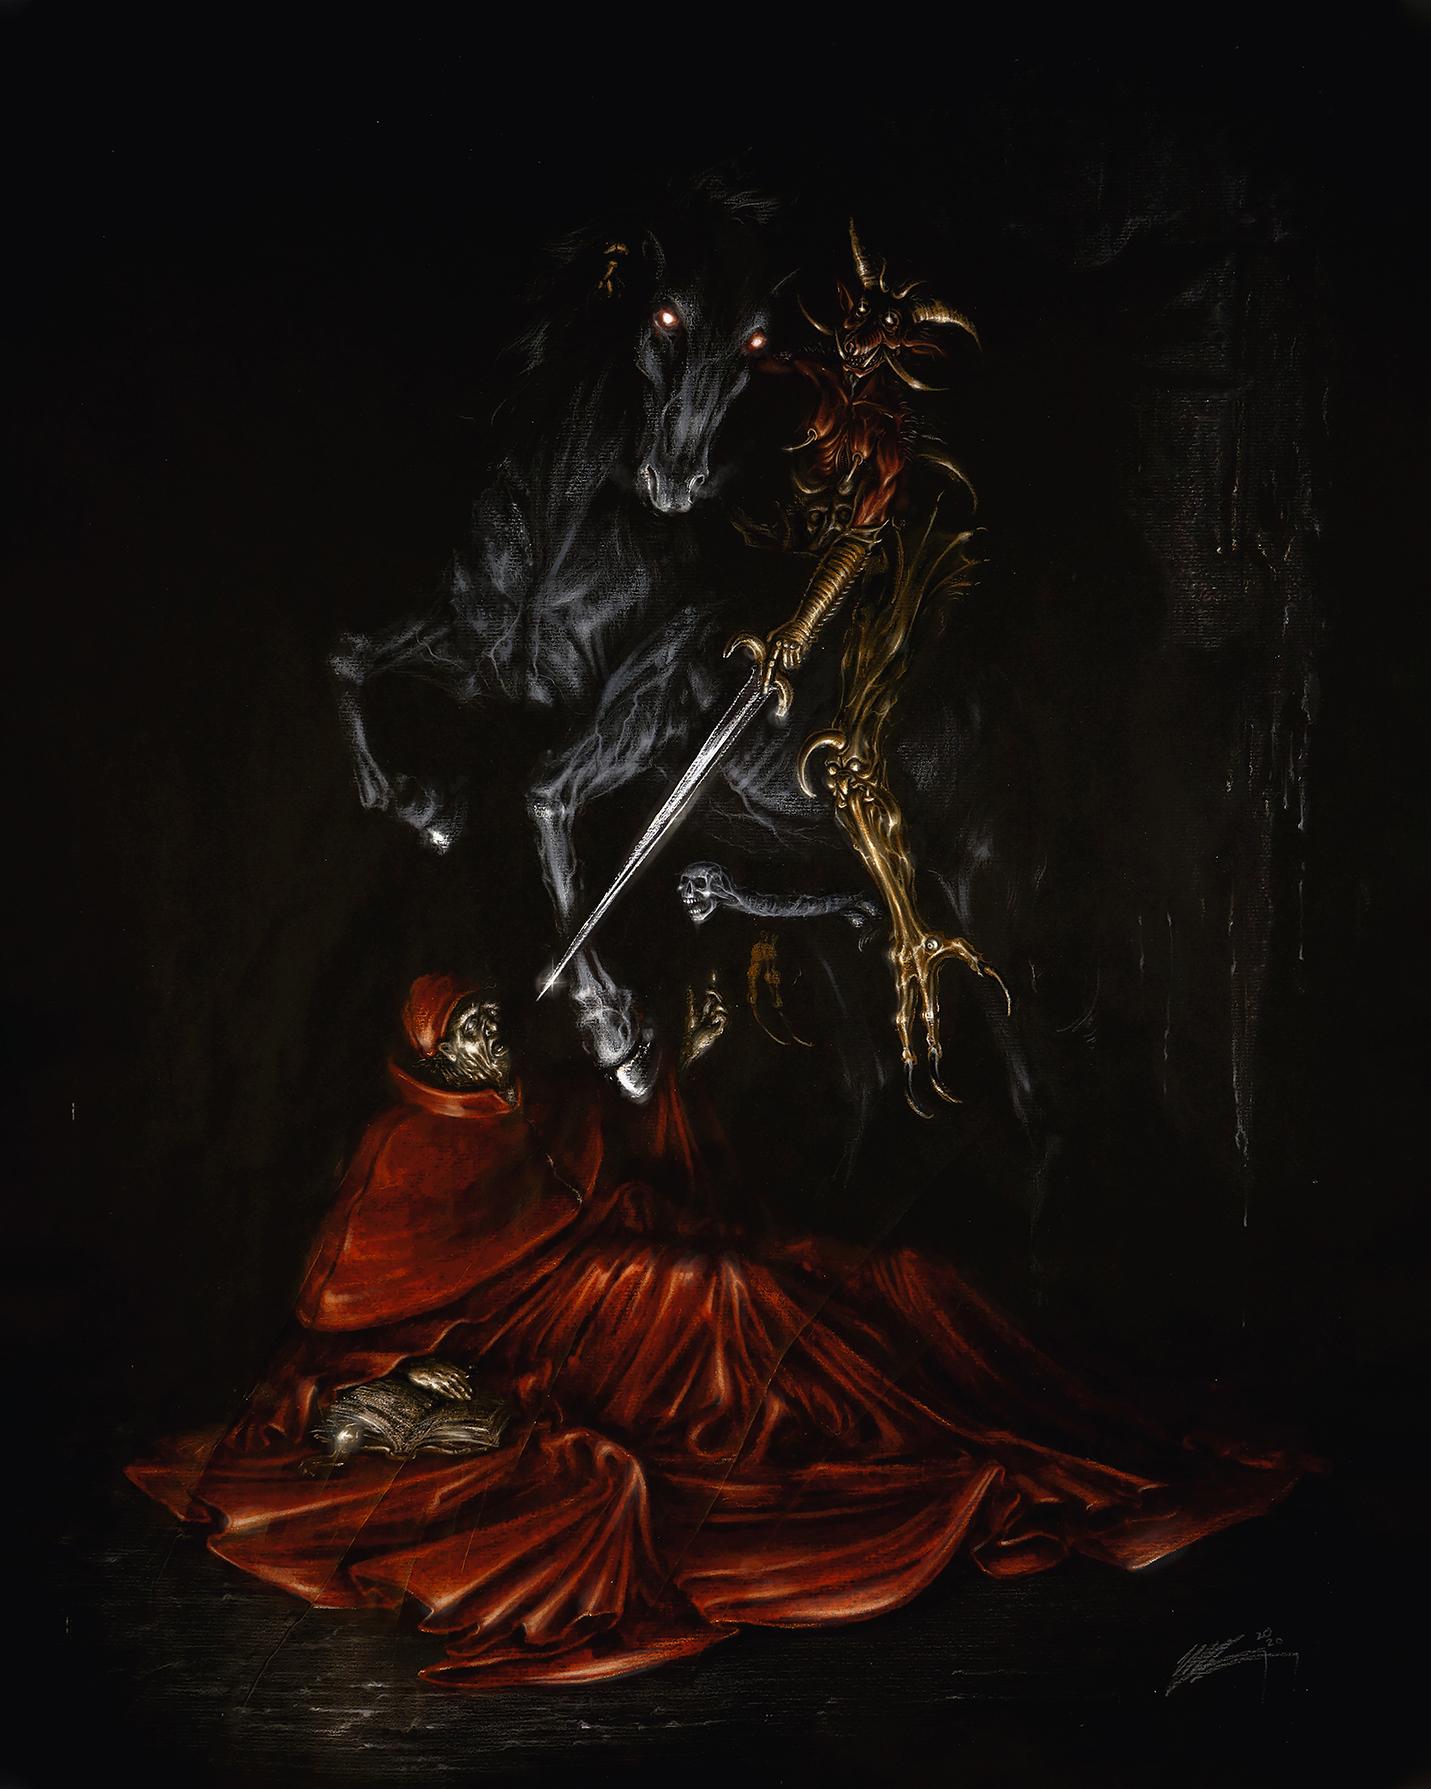 Death of a Clergyman